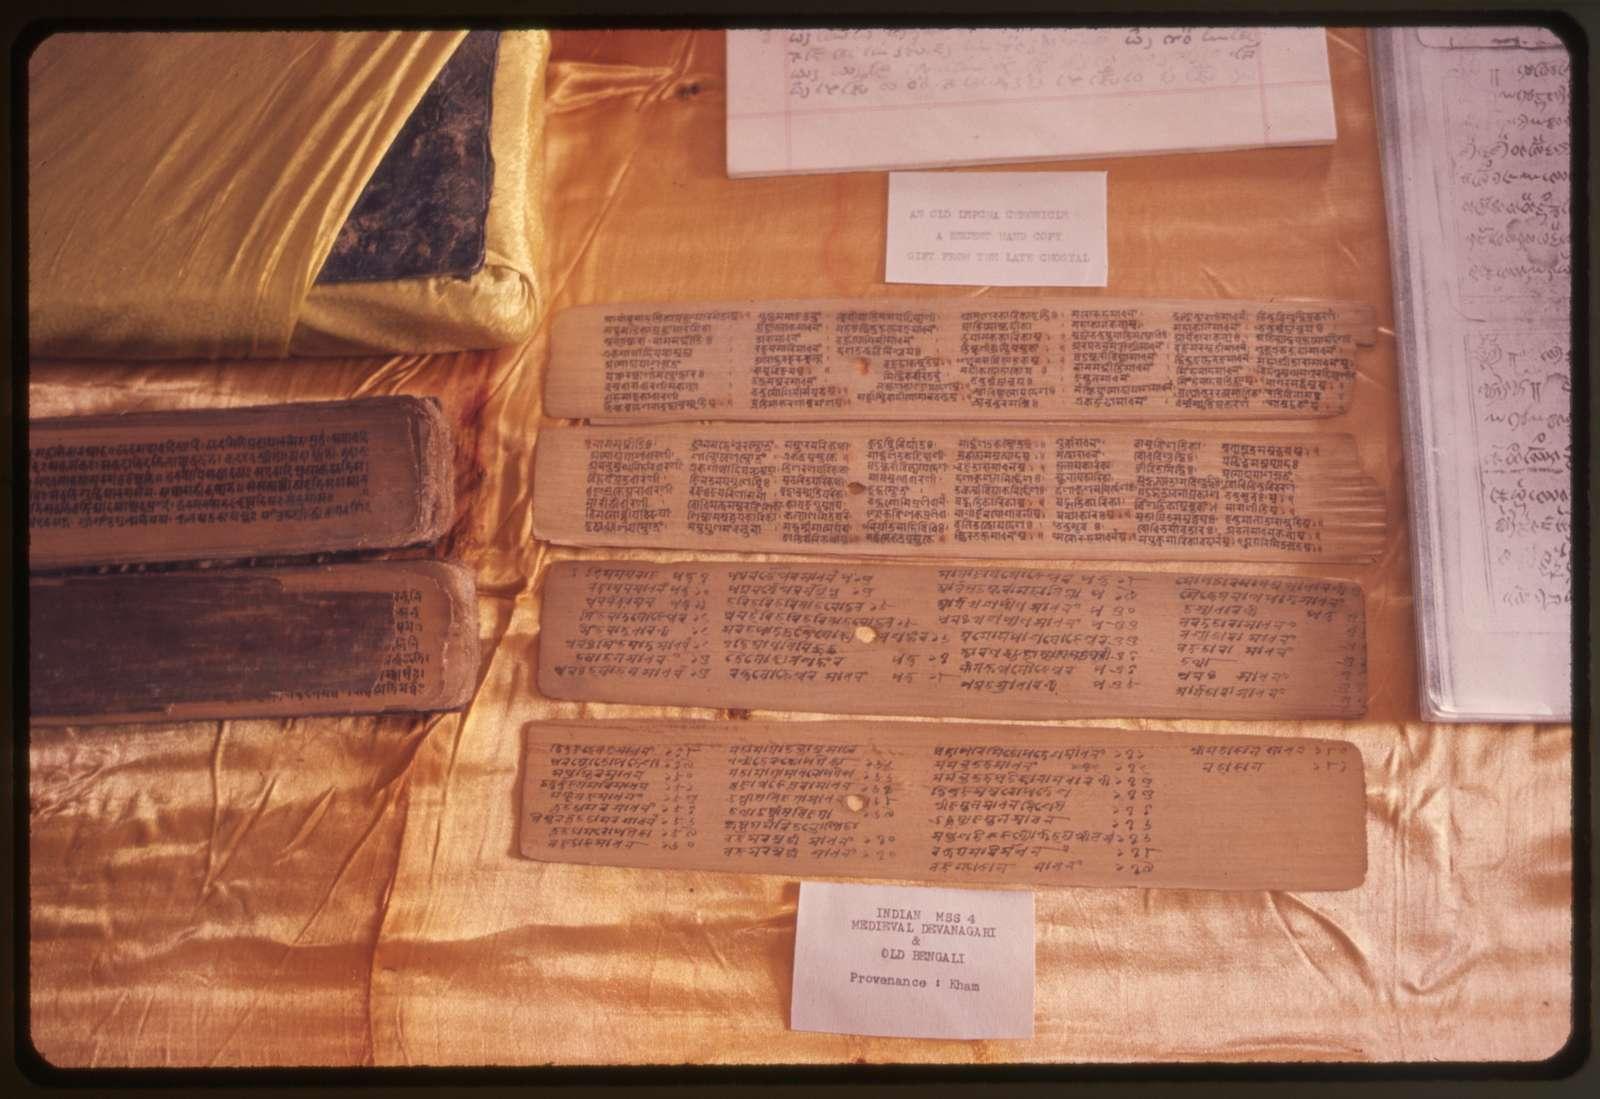 Sikkim, Gangtok, early Buddhist scrip[t] written on palm leave[s]